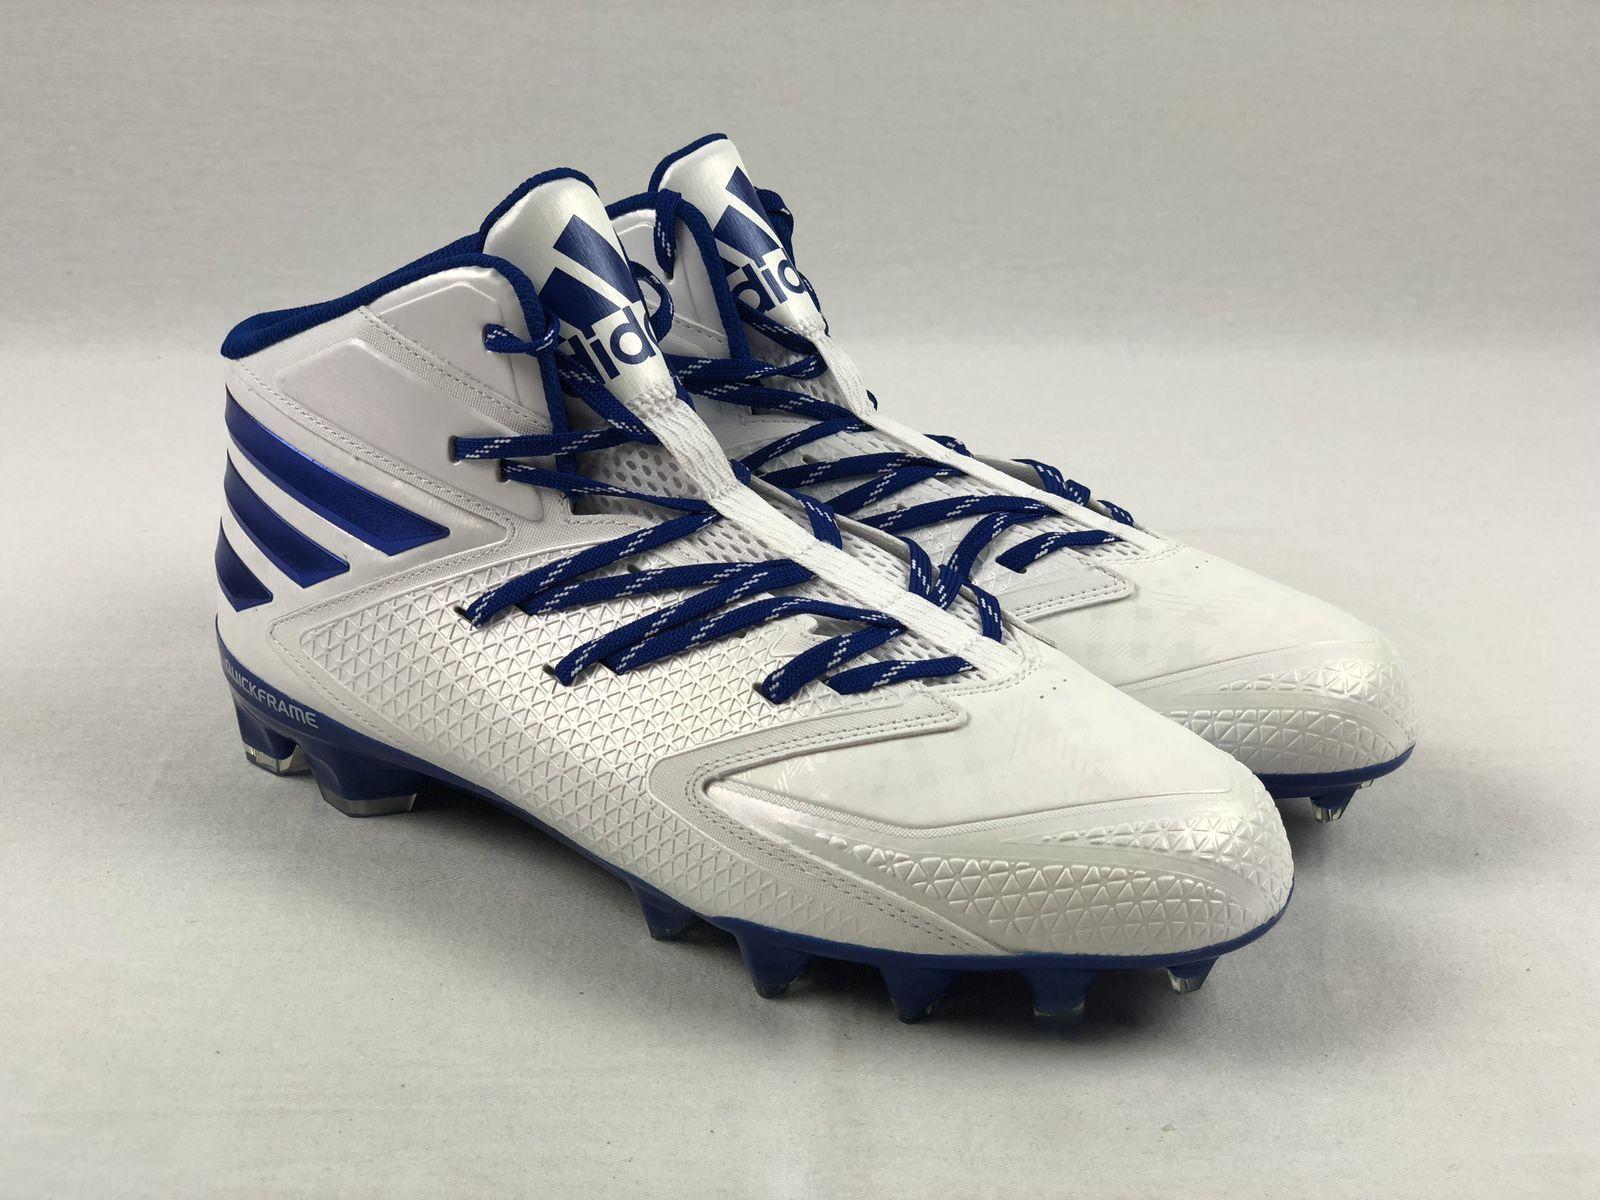 10f40218382 NEW adidas Freak Carbon Mid - White bluee (Men s Sizes) Cleats Multiple  nvpgif2019-Men